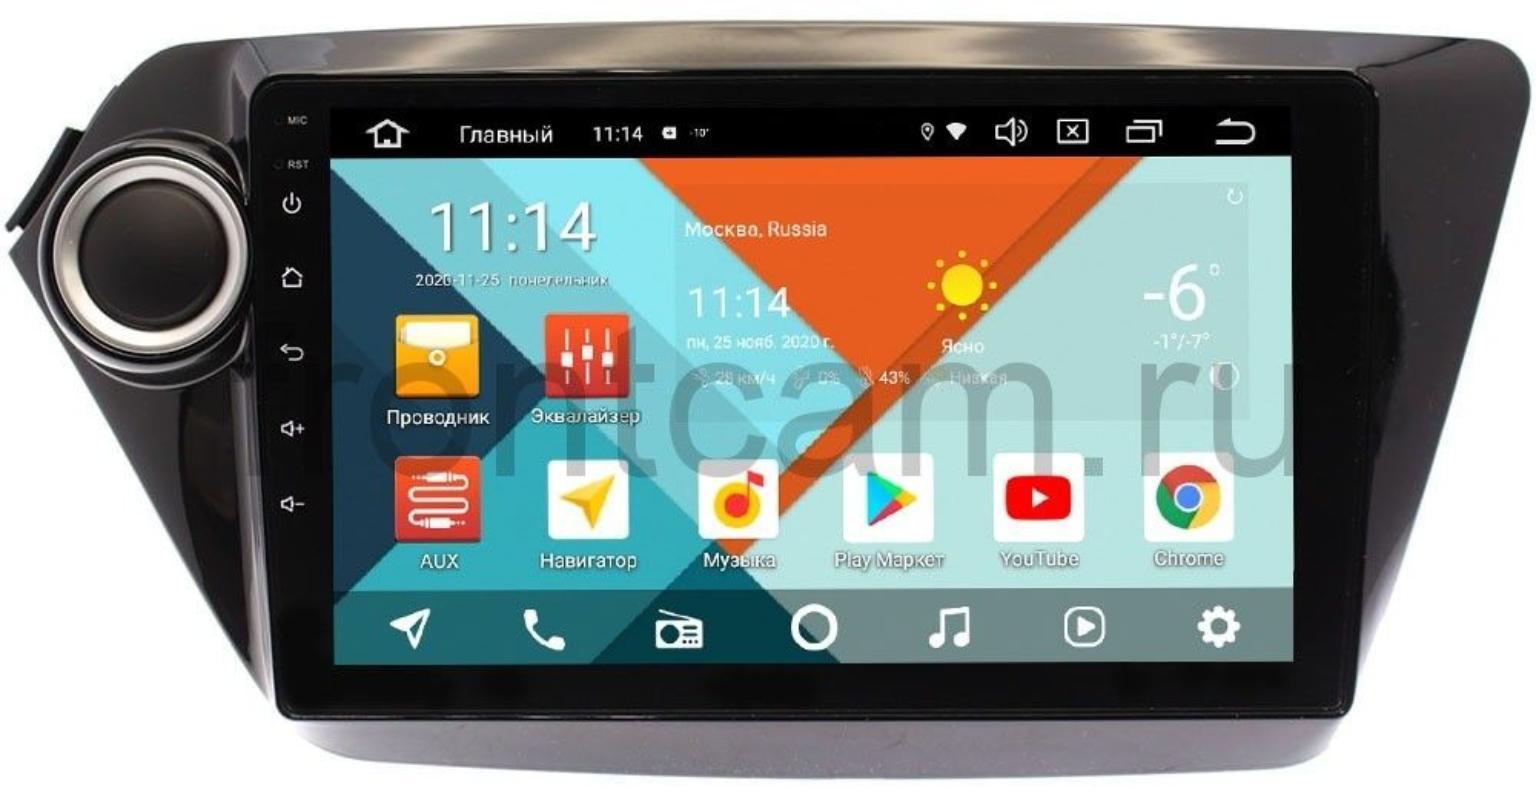 Штатная магнитола Kia Rio III 2011-2017 Wide Media KS9011QM-2/32 DSP CarPlay 4G-SIM на Android 10 (+ Камера заднего вида в подарок!)